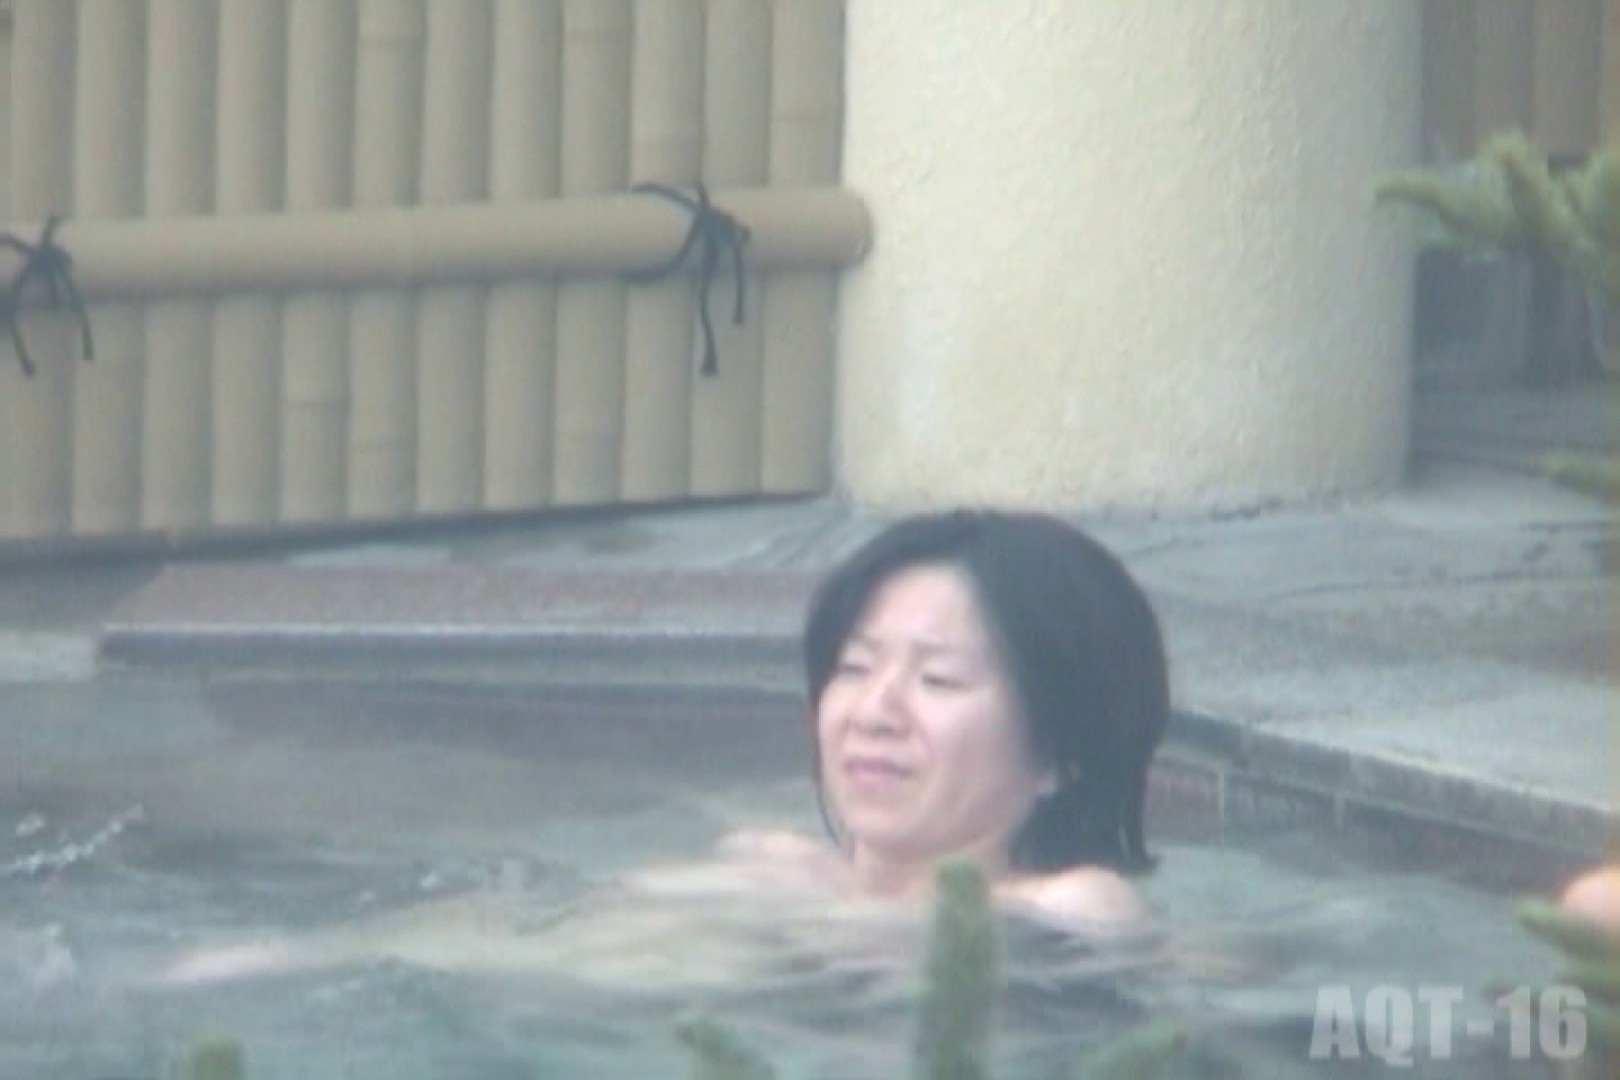 Aquaな露天風呂Vol.841 露天 のぞき動画キャプチャ 86pic 67